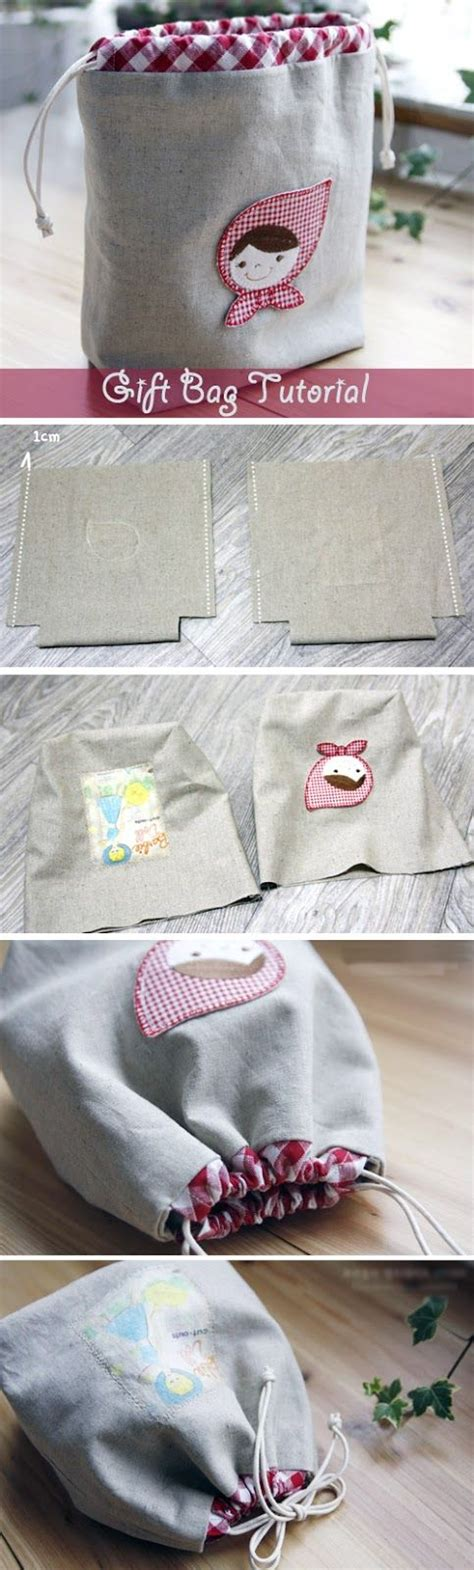 Tutorial Mini Doctor Bag 手藝星園地 craft 包包製作教學 bag tutorial